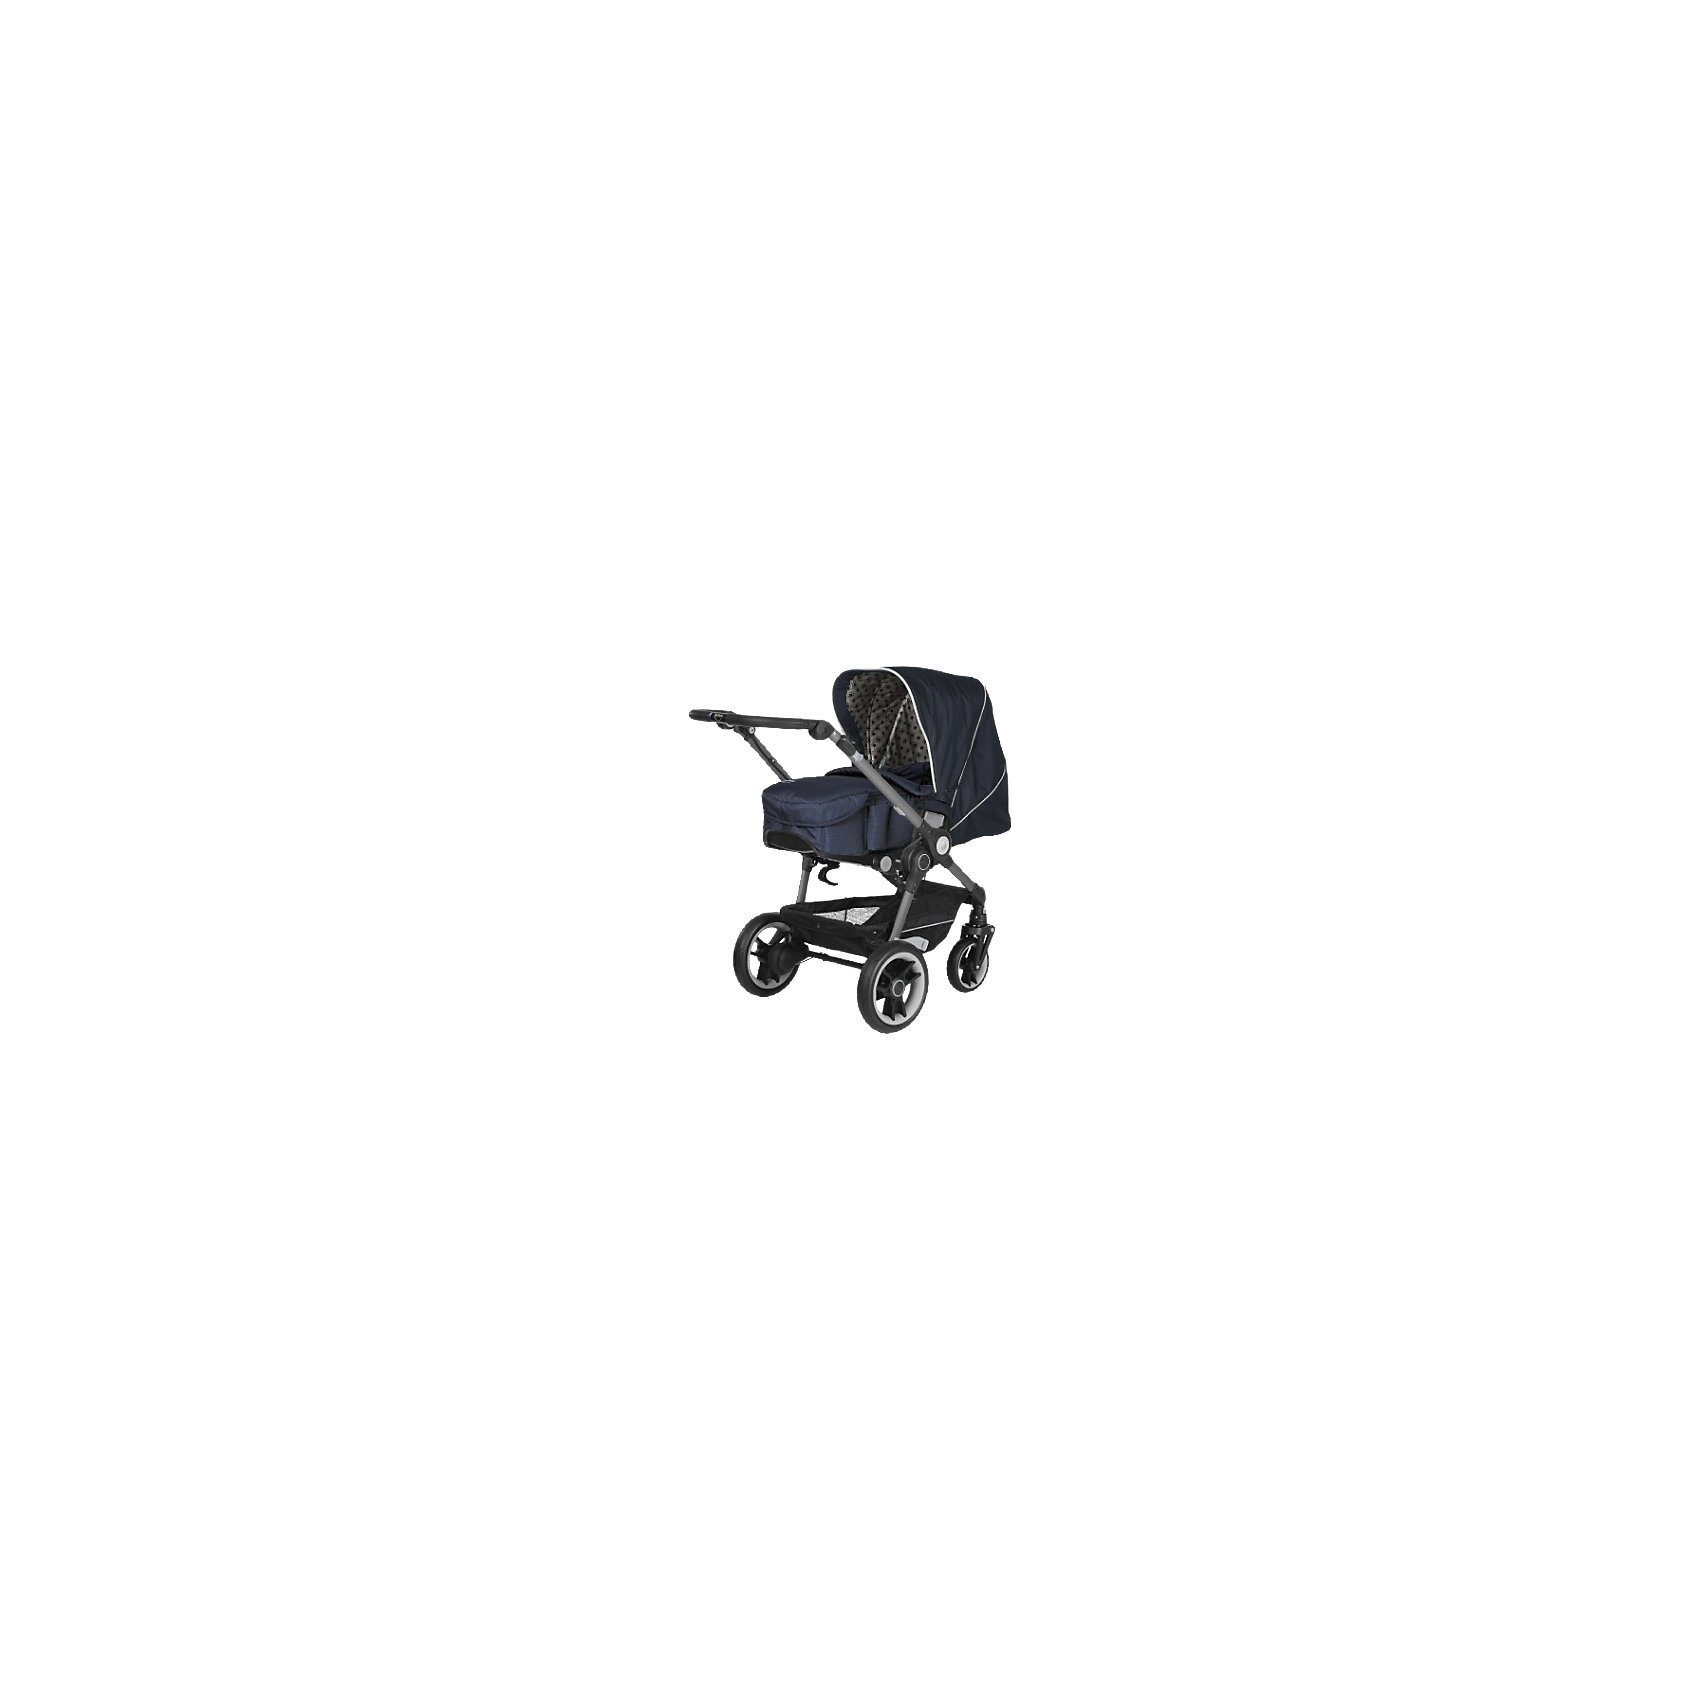 Teutonia Kombi-Kinderwagen BeYou! ELITE inkl. Softtragetasche, Astron